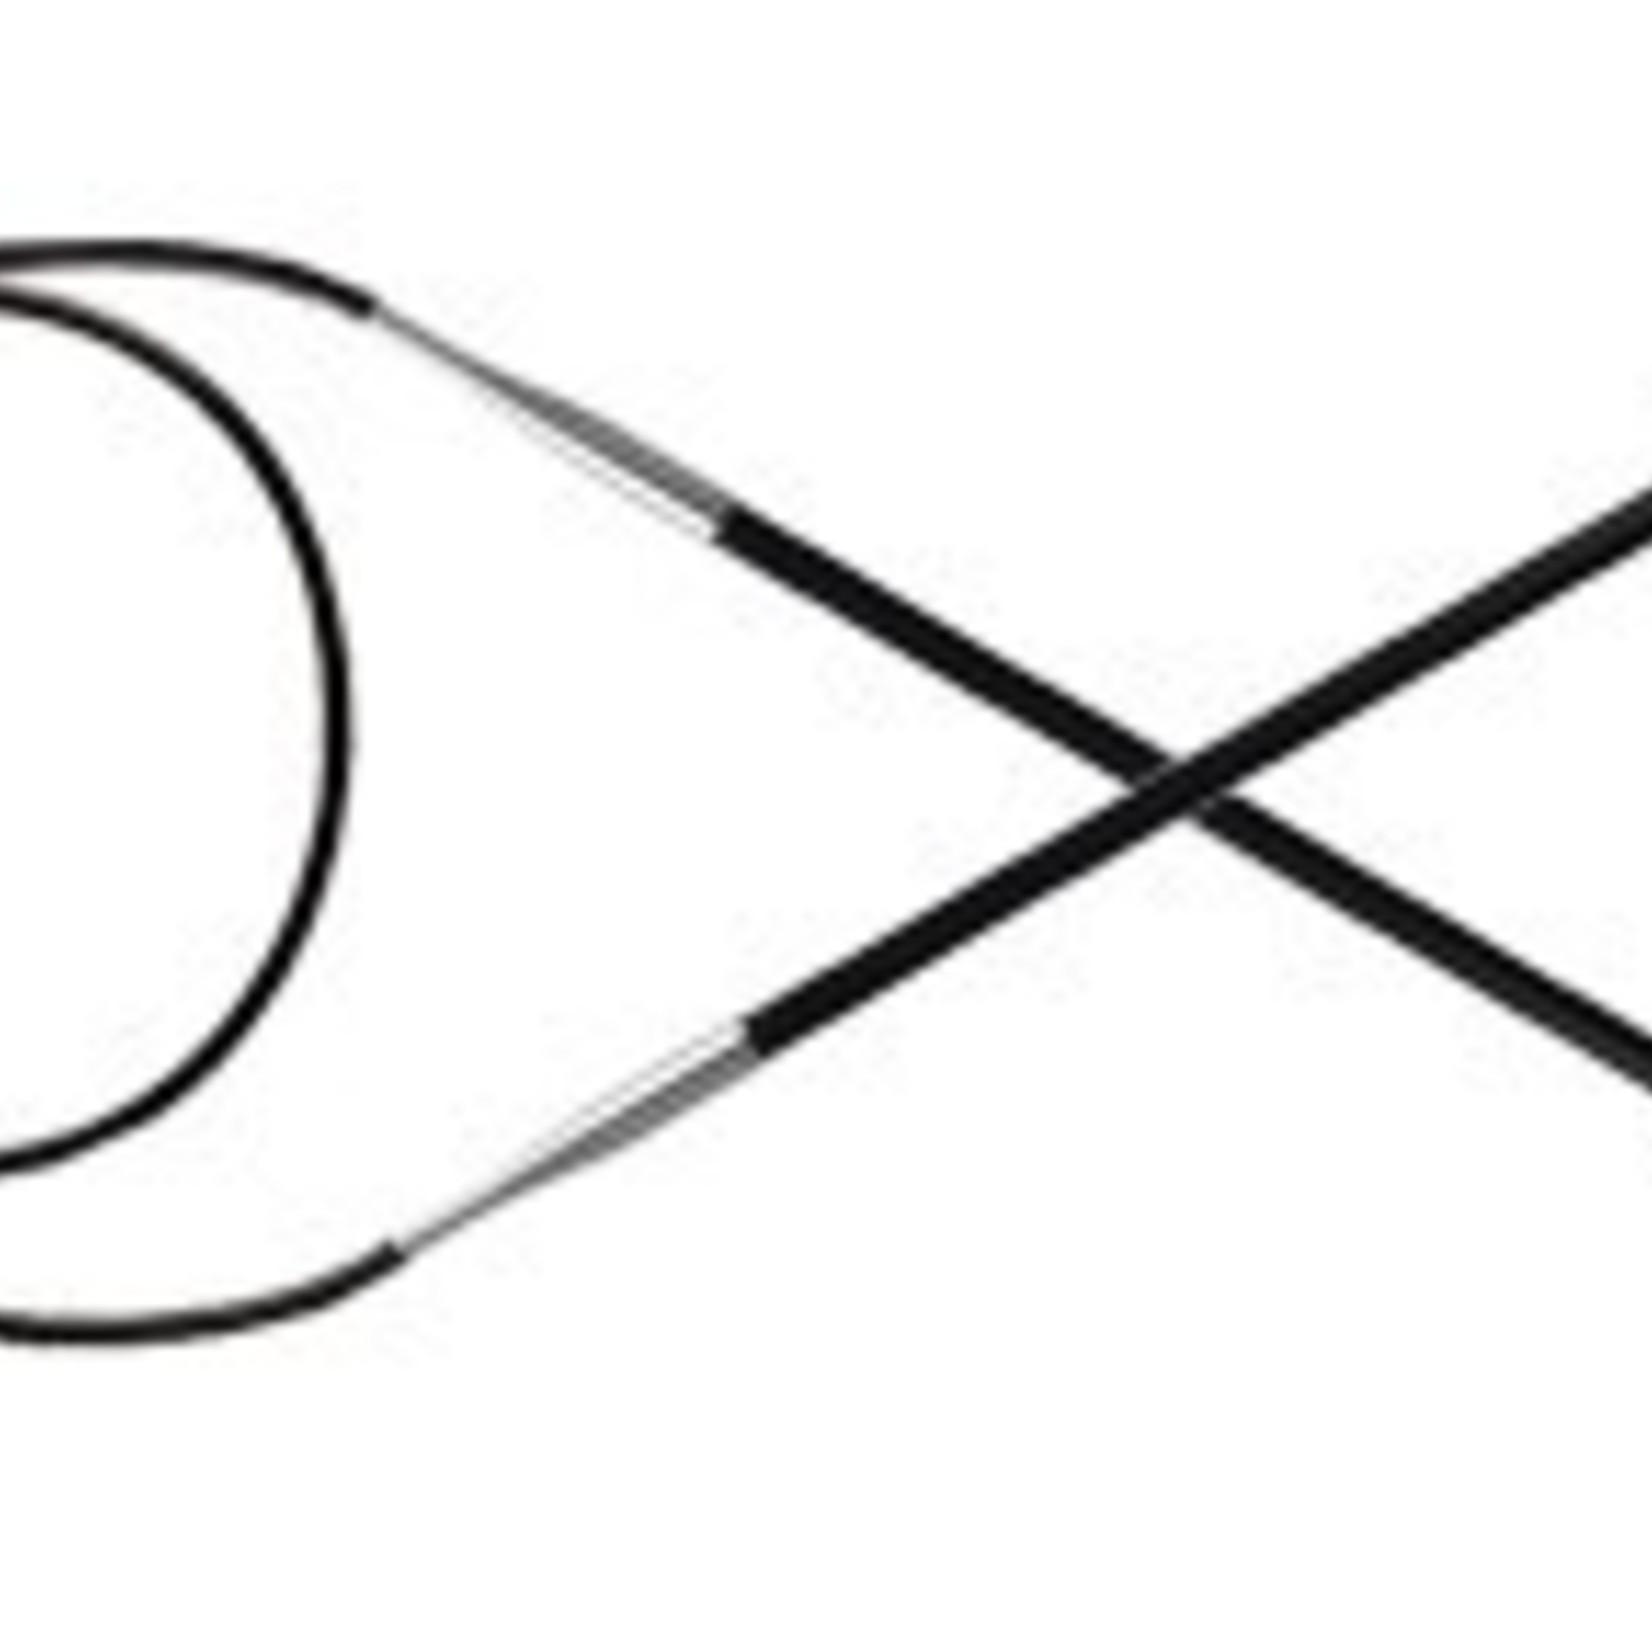 Knitter's Pride 2 Karbonz Circular 24